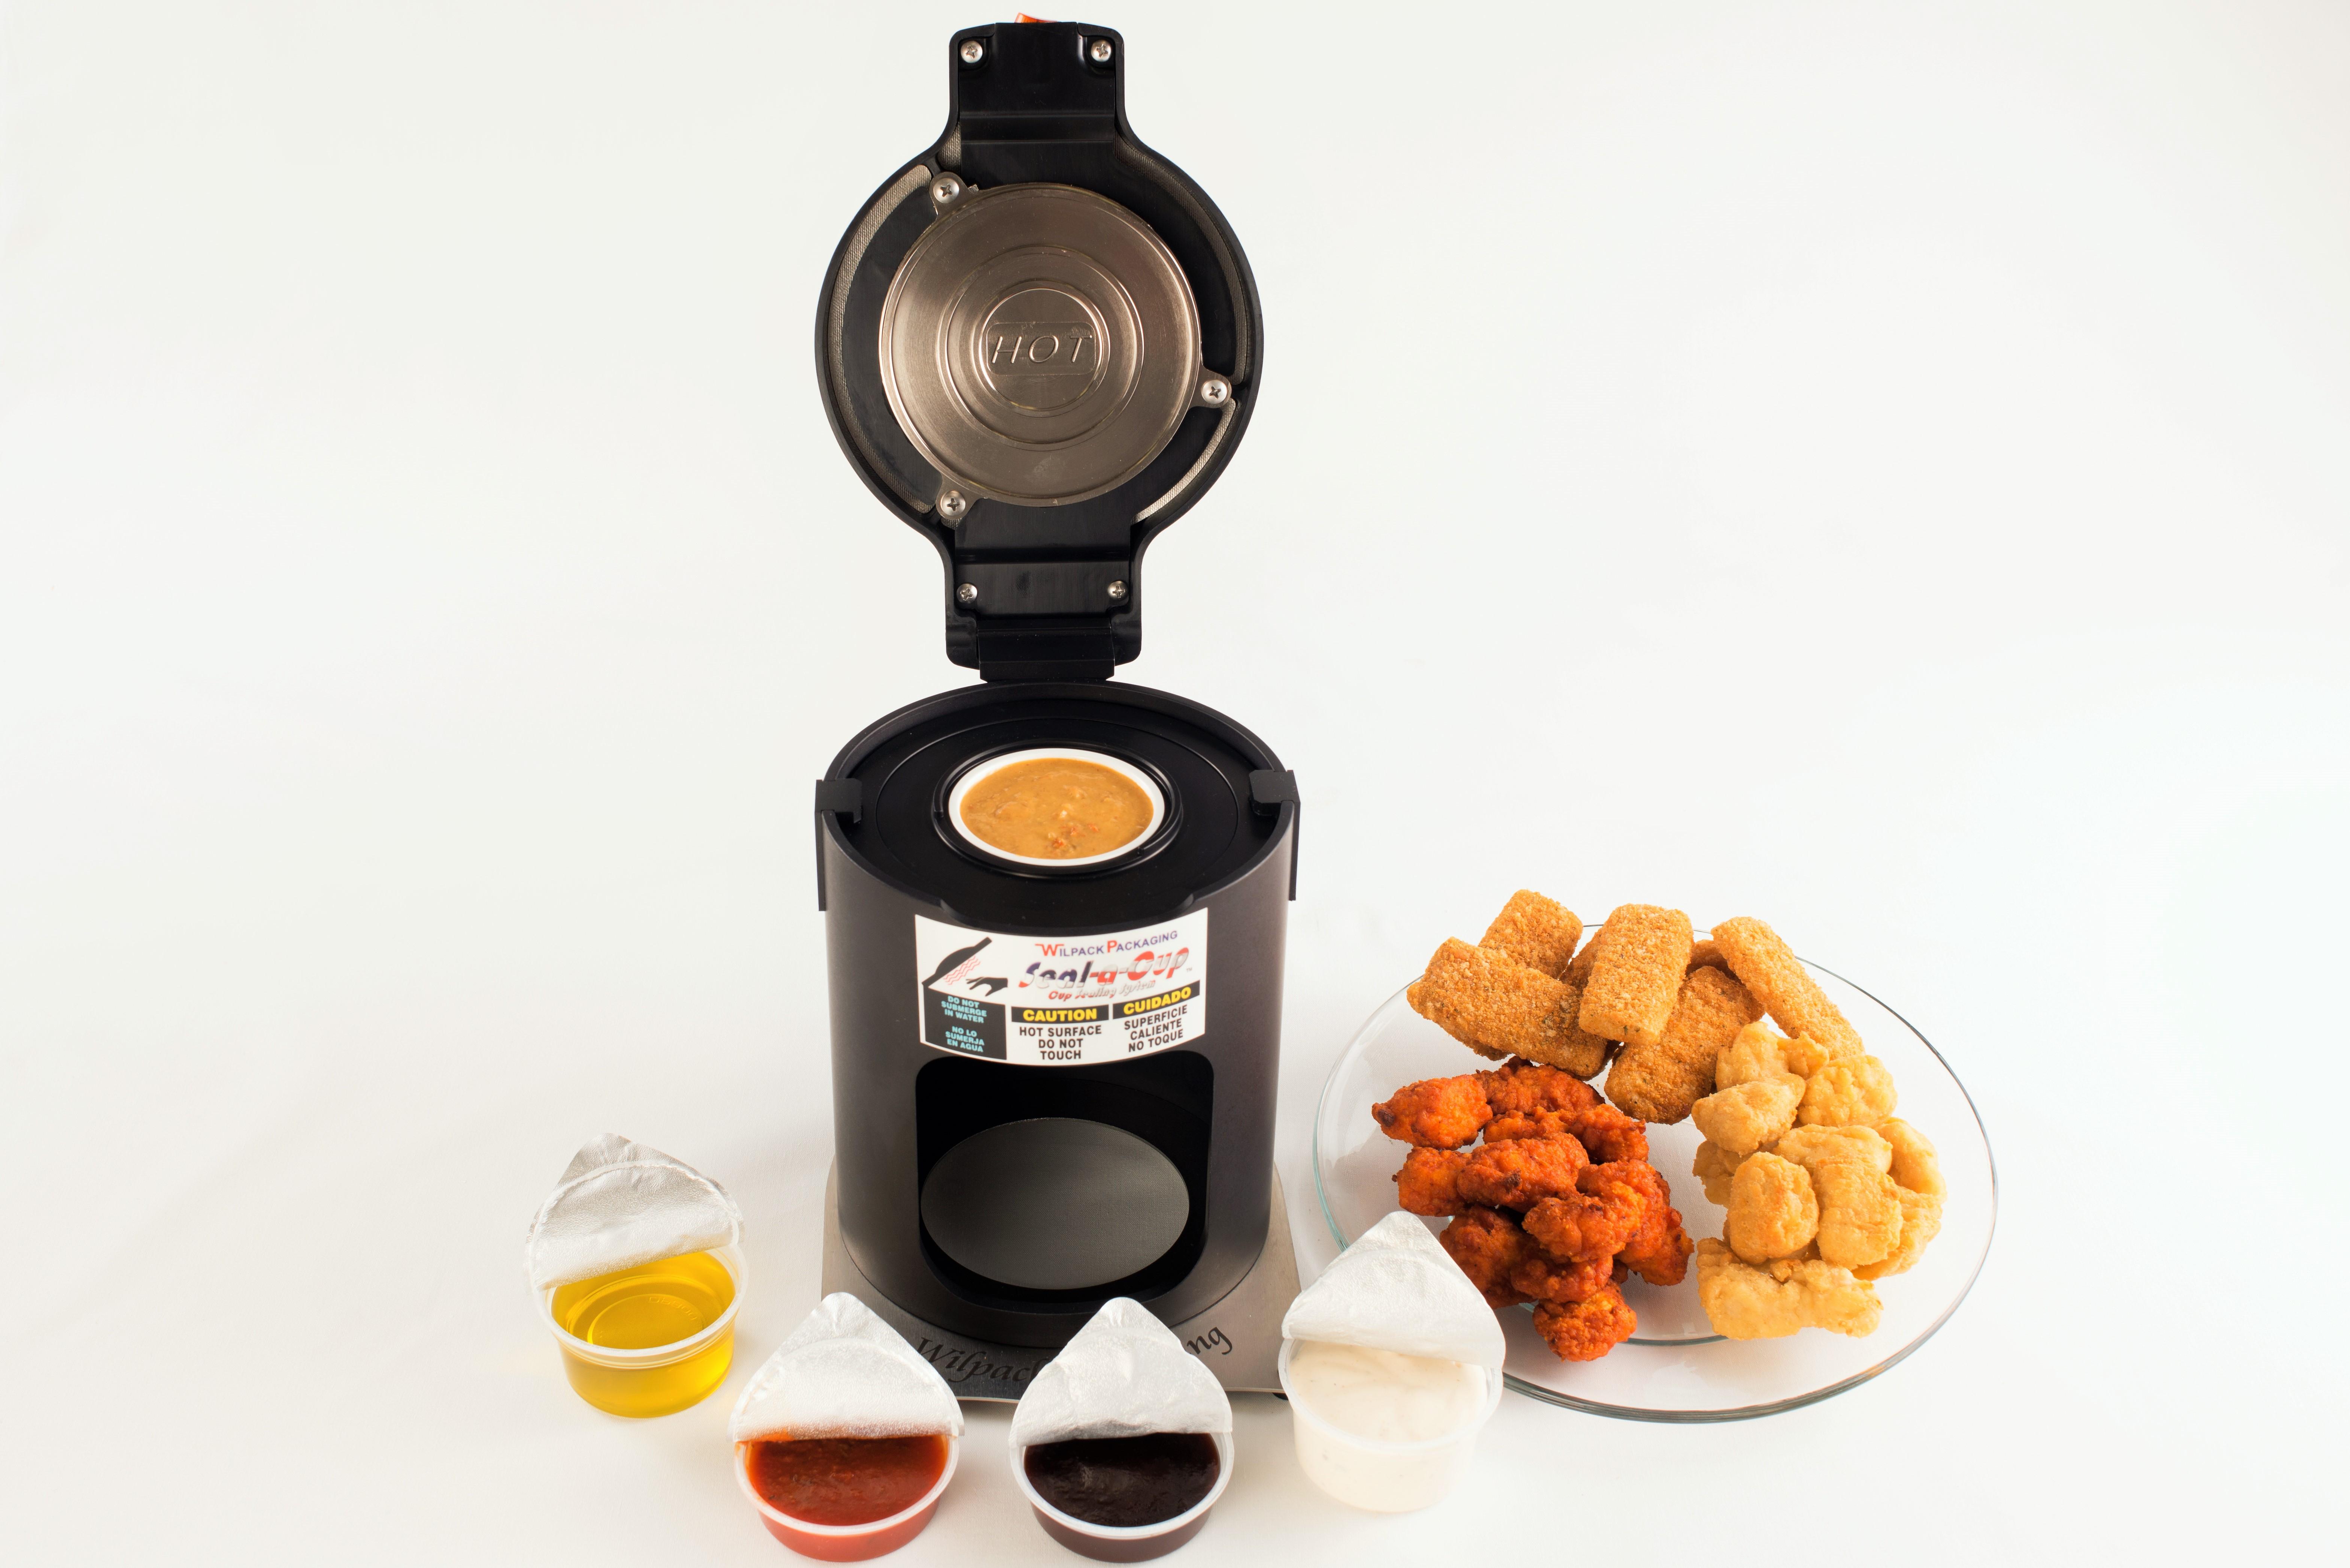 Food Sealing Machine for Deli Restaurants